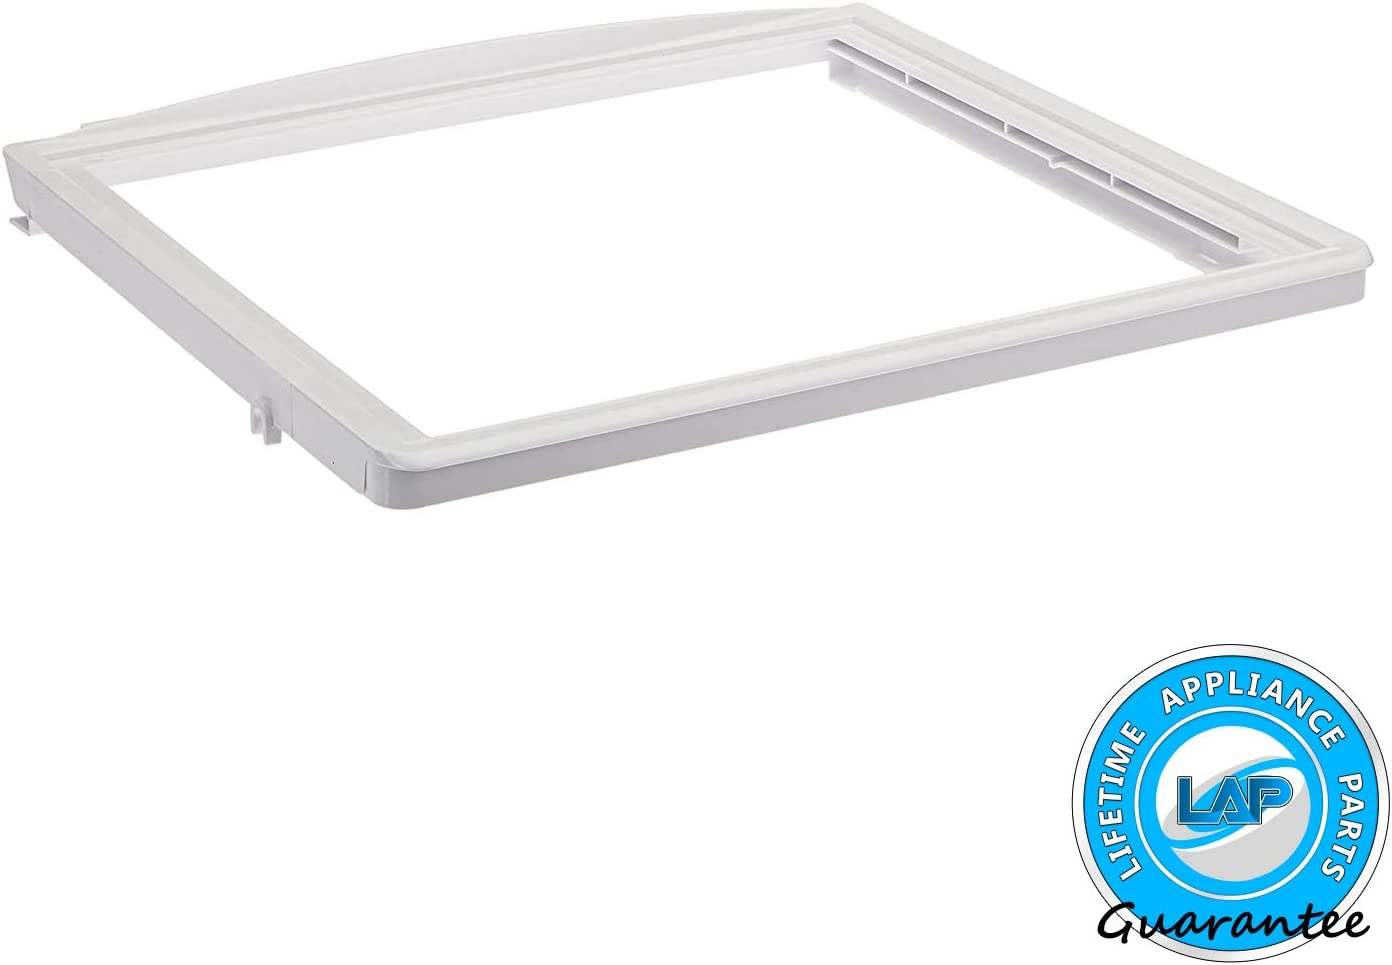 Lifetime Appliance 240599803 Crisper Pan Cover Compatible with Frigidaire Refrigerator